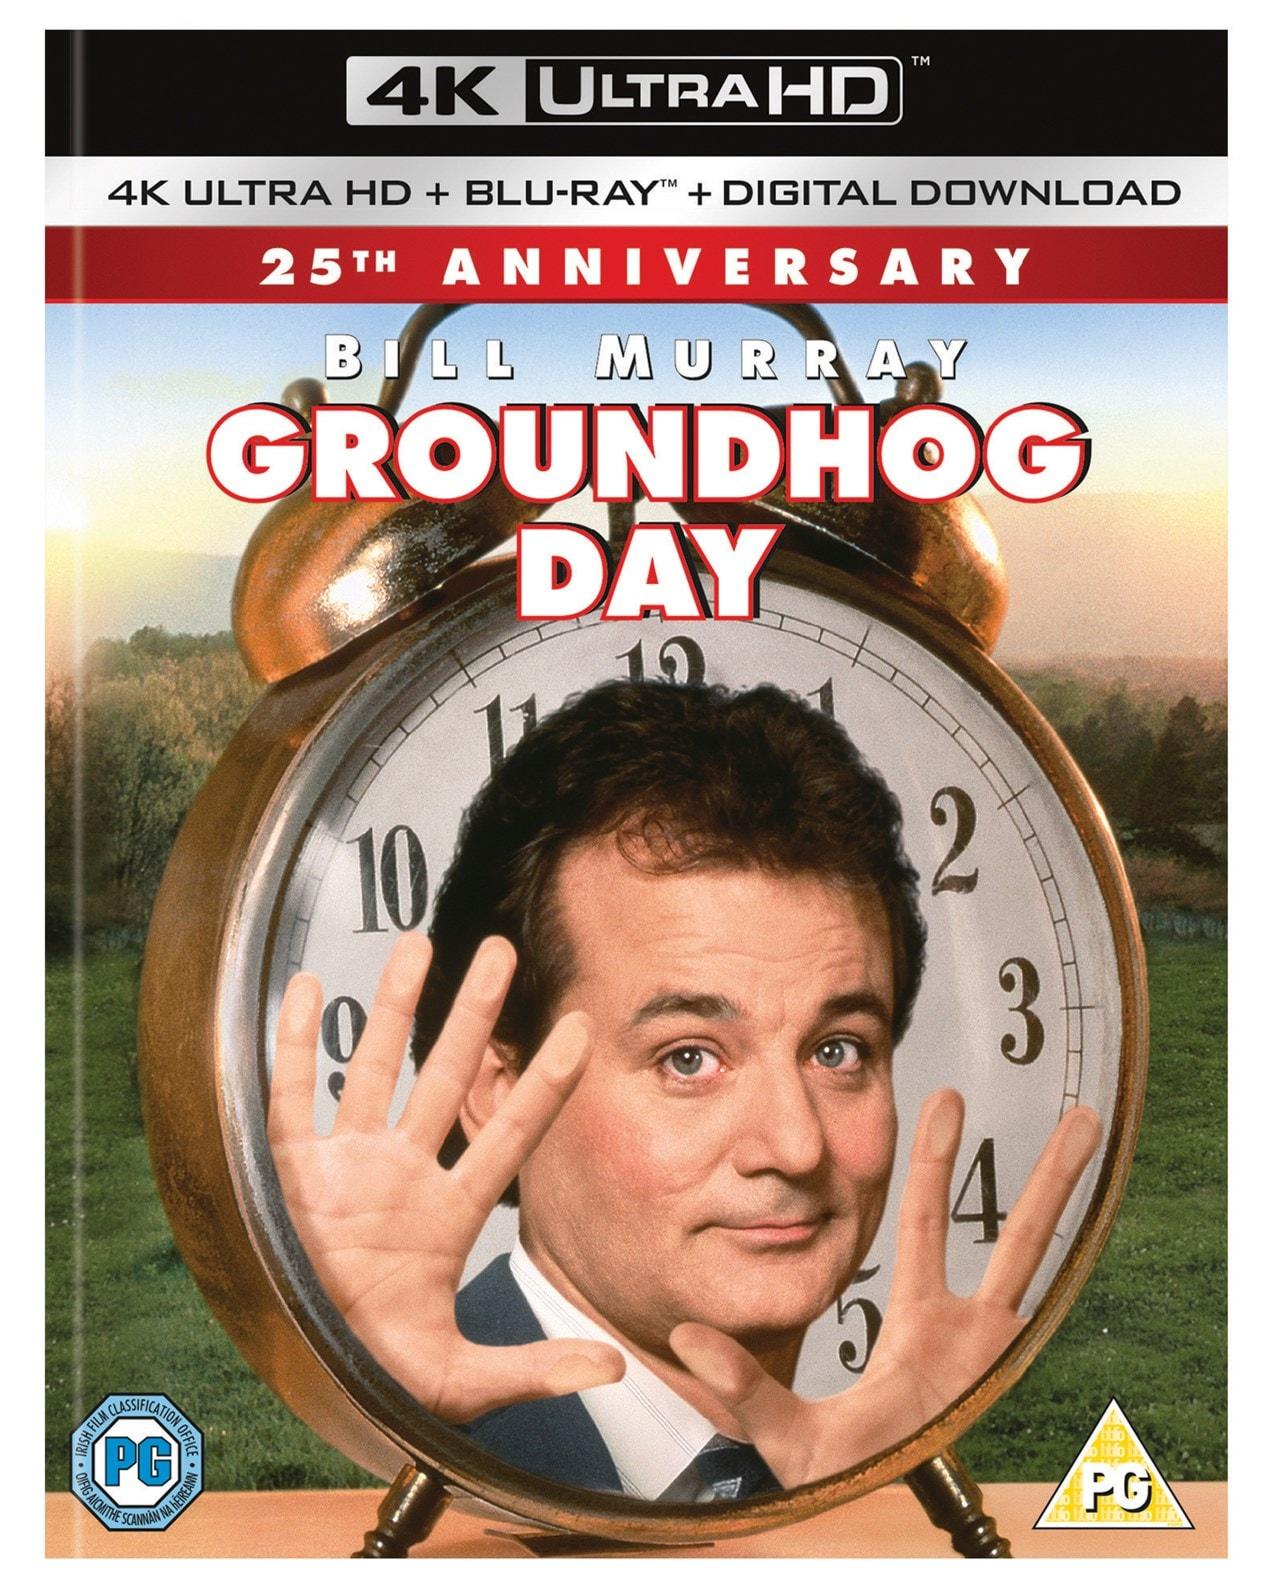 Groundhog Day - 1